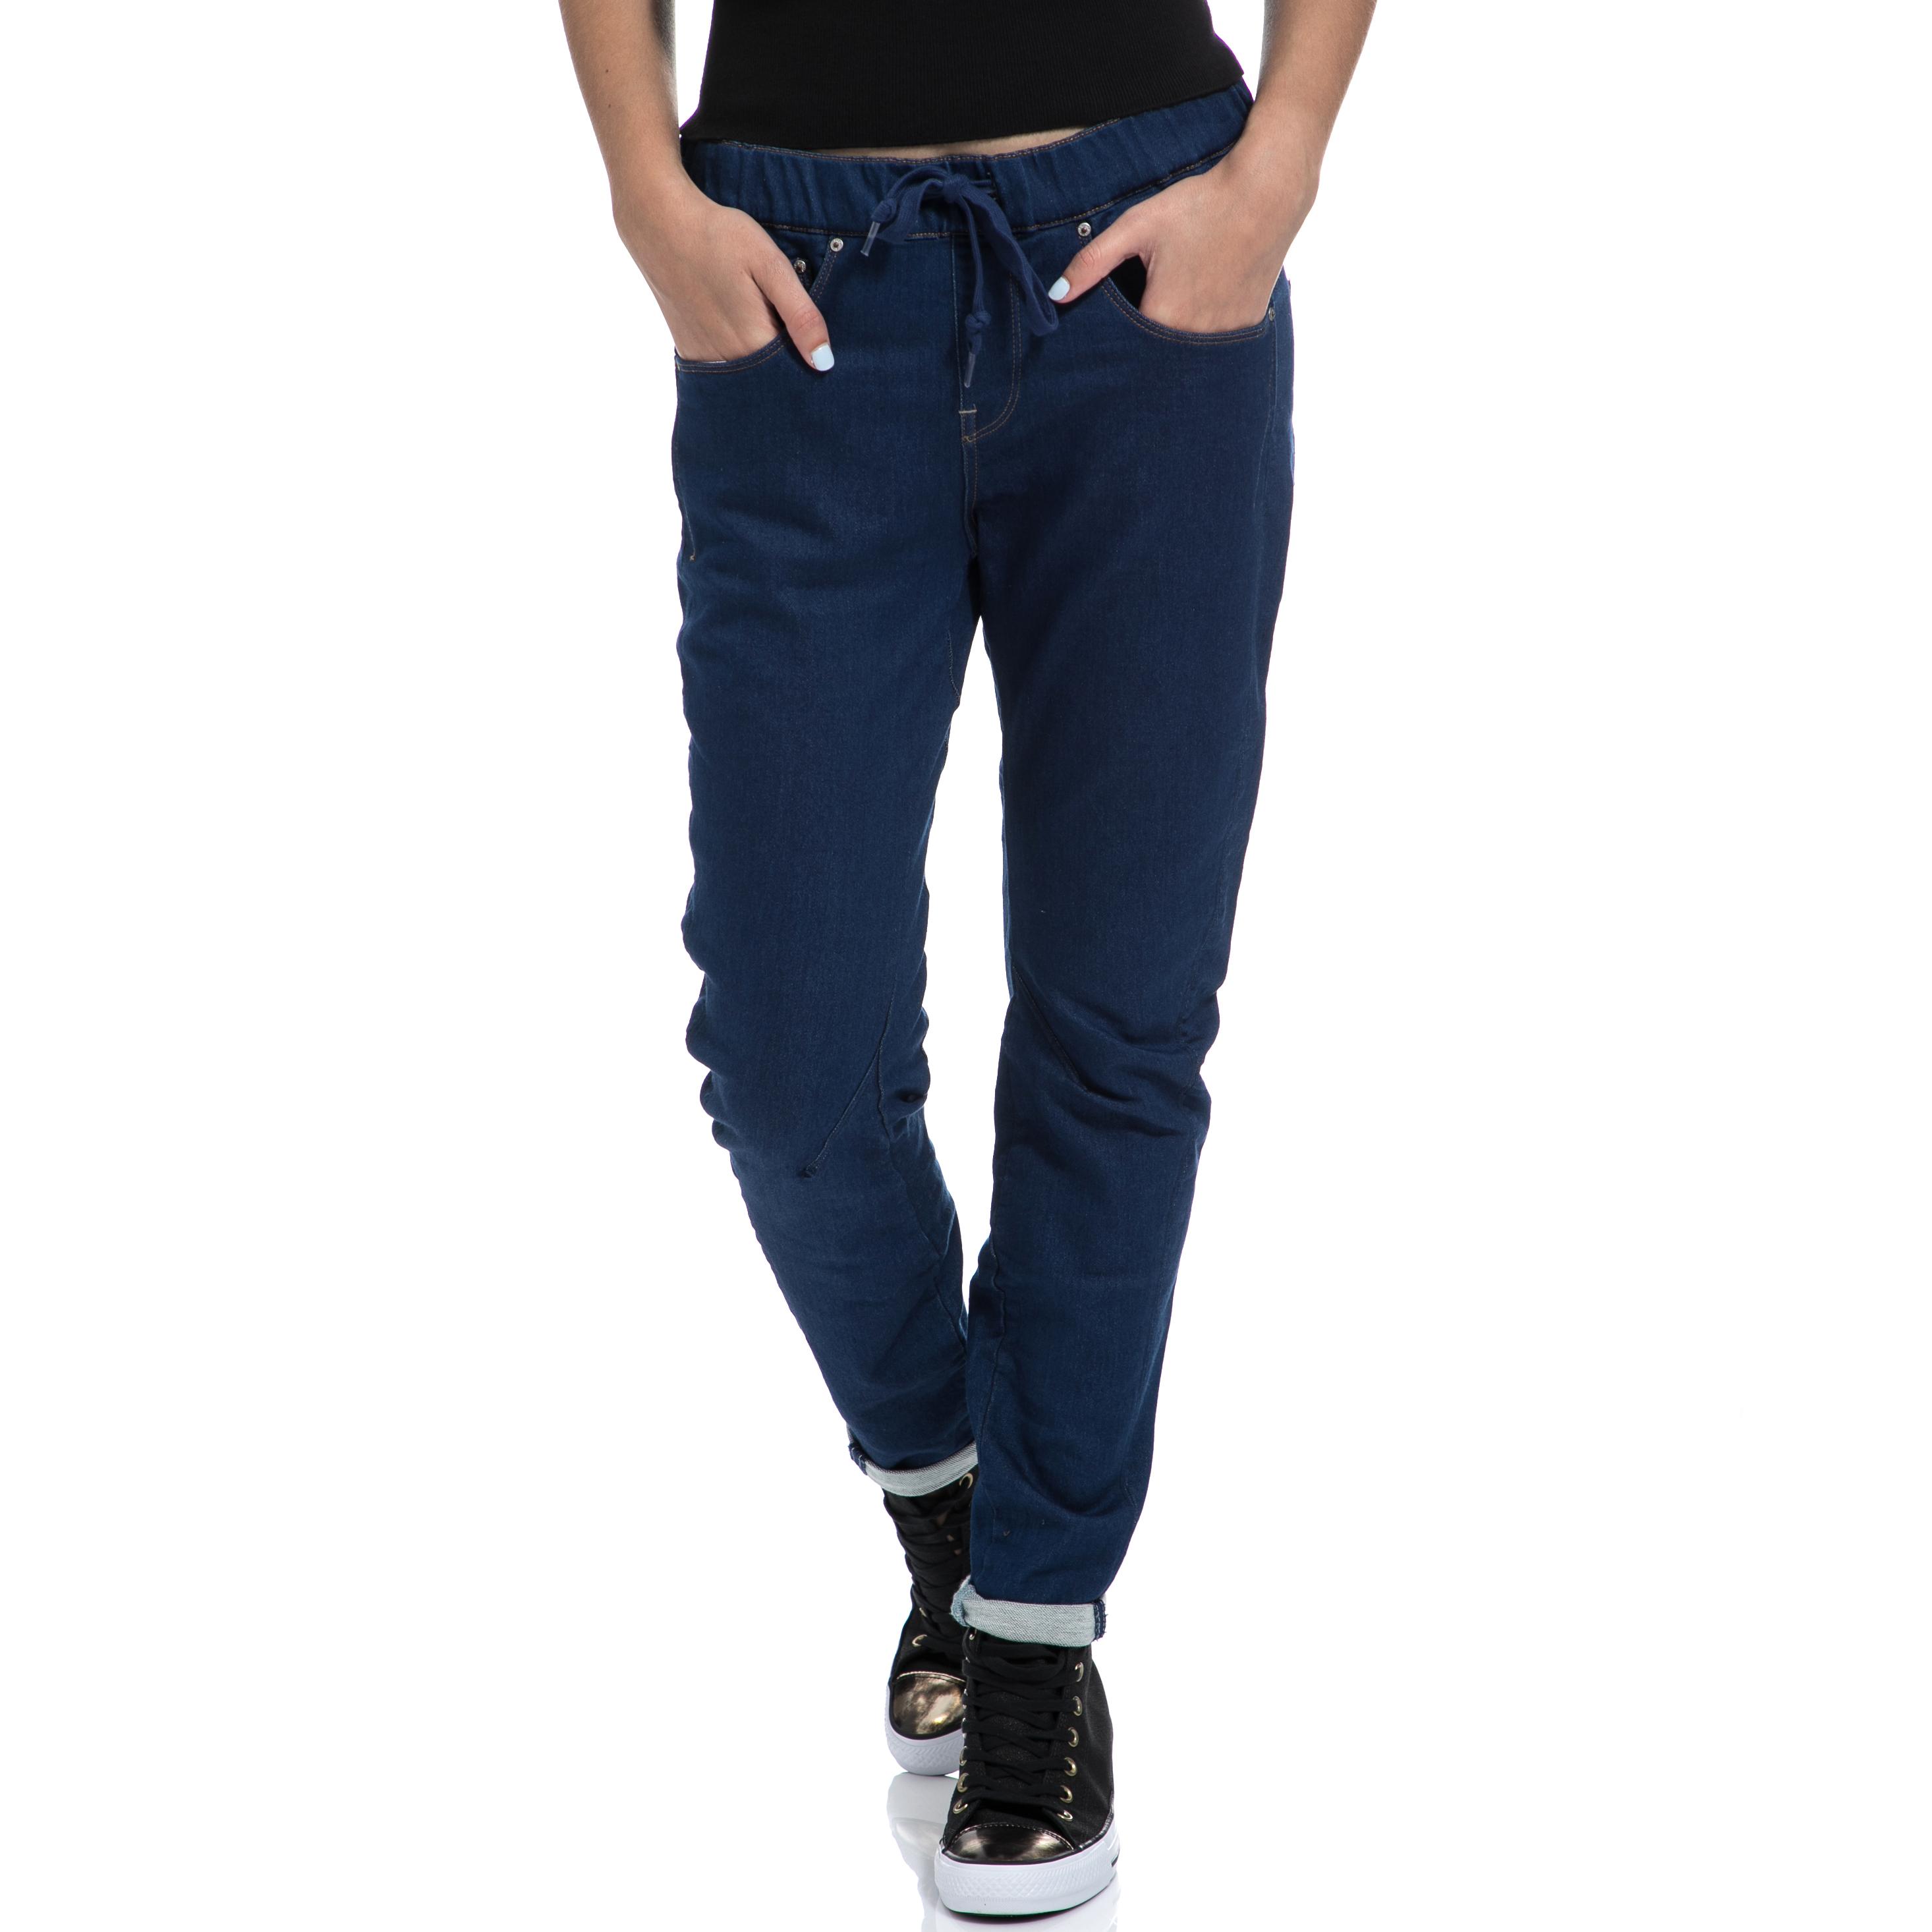 G-STAR RAW - Γυναικείο παντελόνι G-STAR RAW μπλε γυναικεία ρούχα τζίν boyfriend